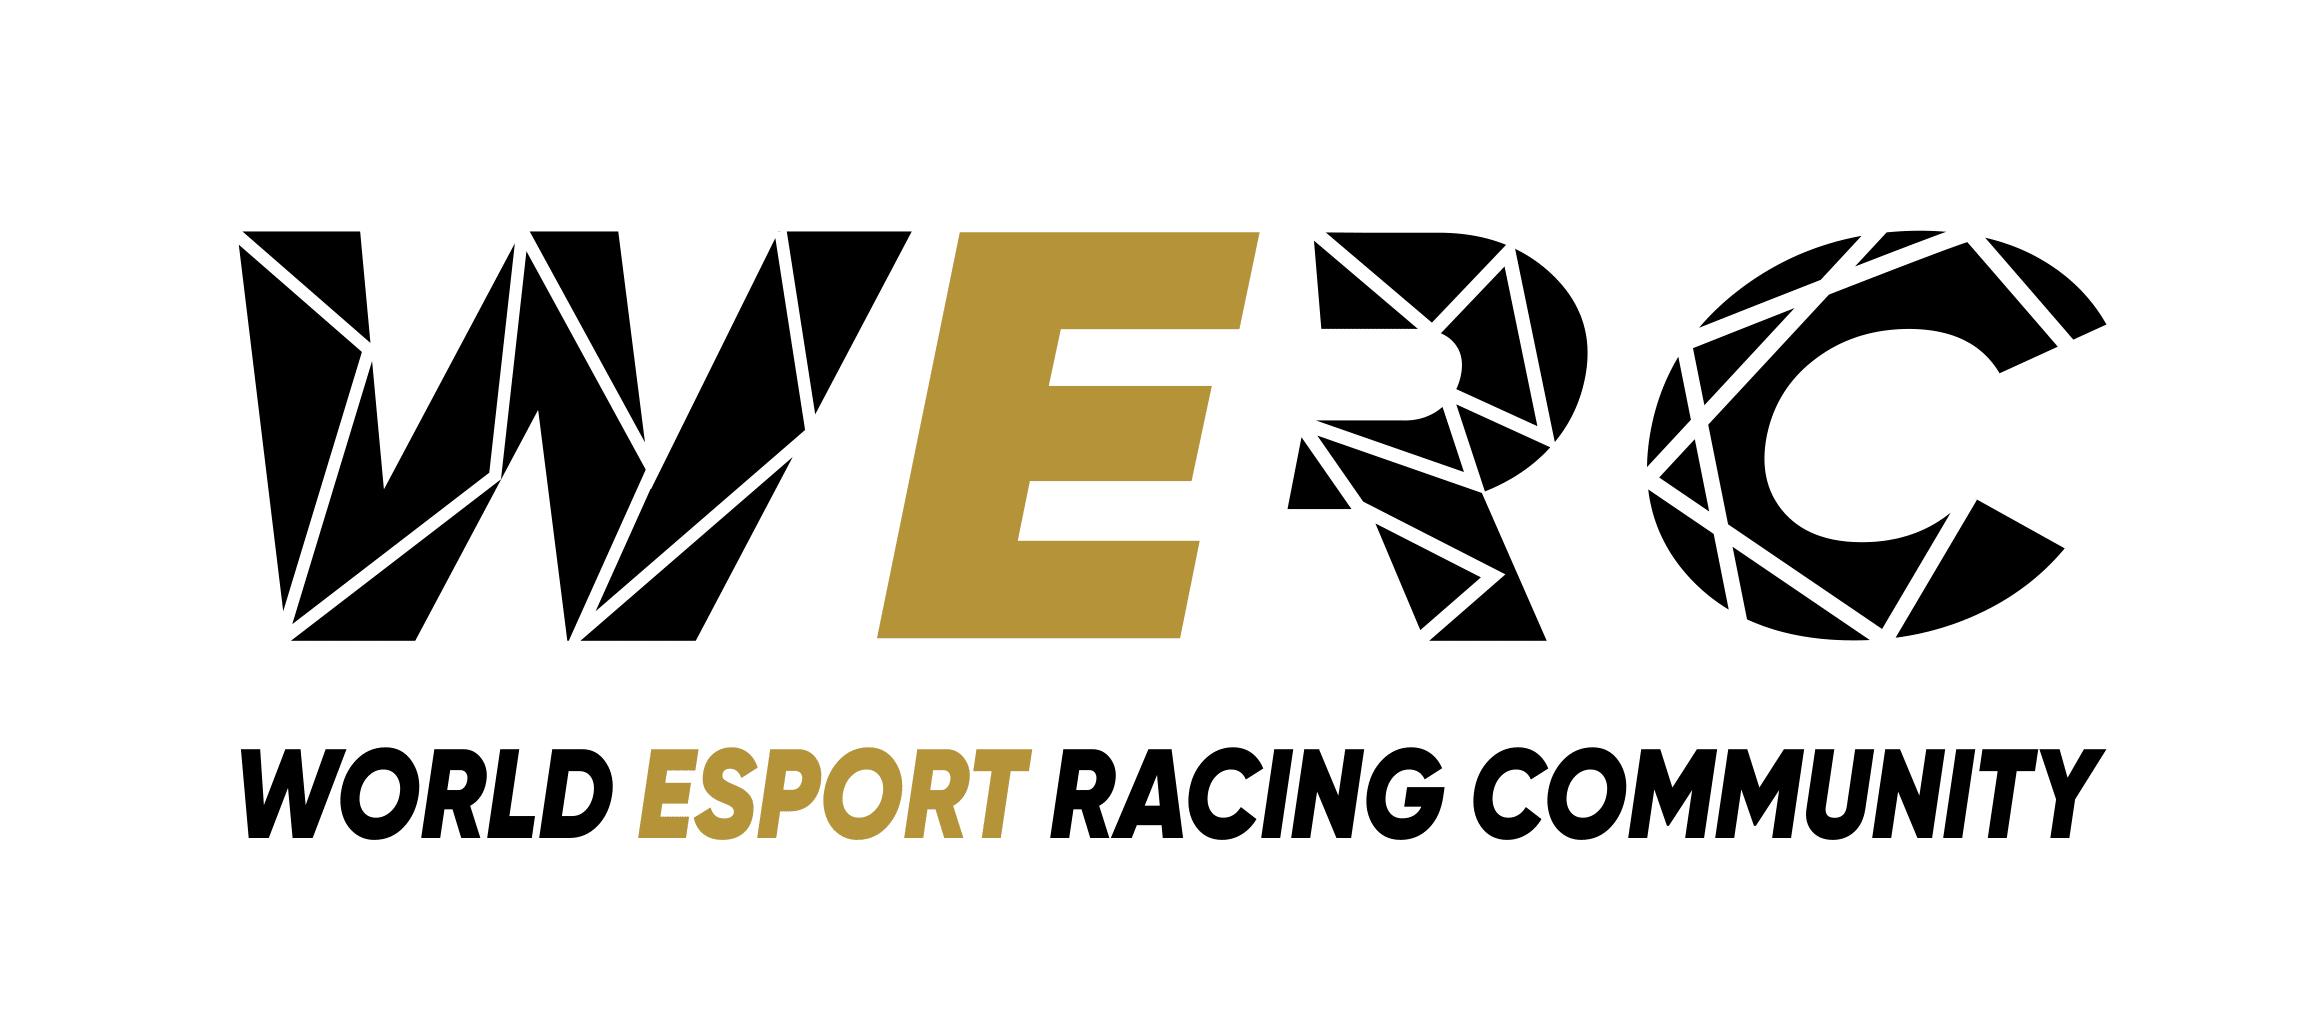 World Esports Racing Community